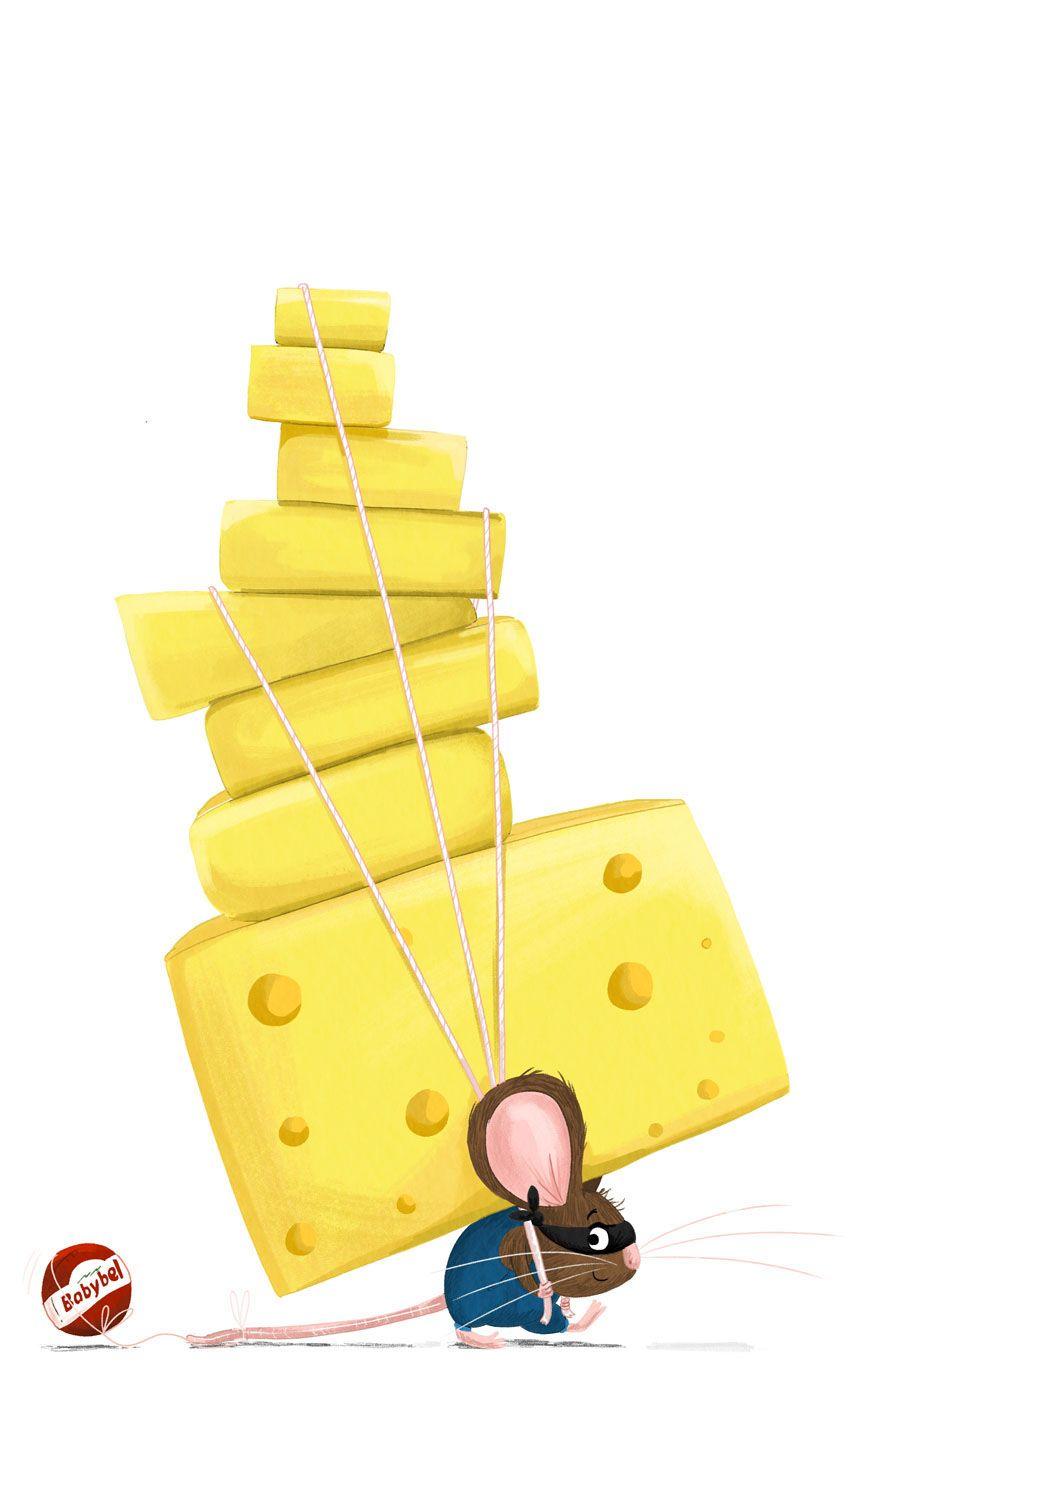 Robert the Littlest cheese thief on Behance